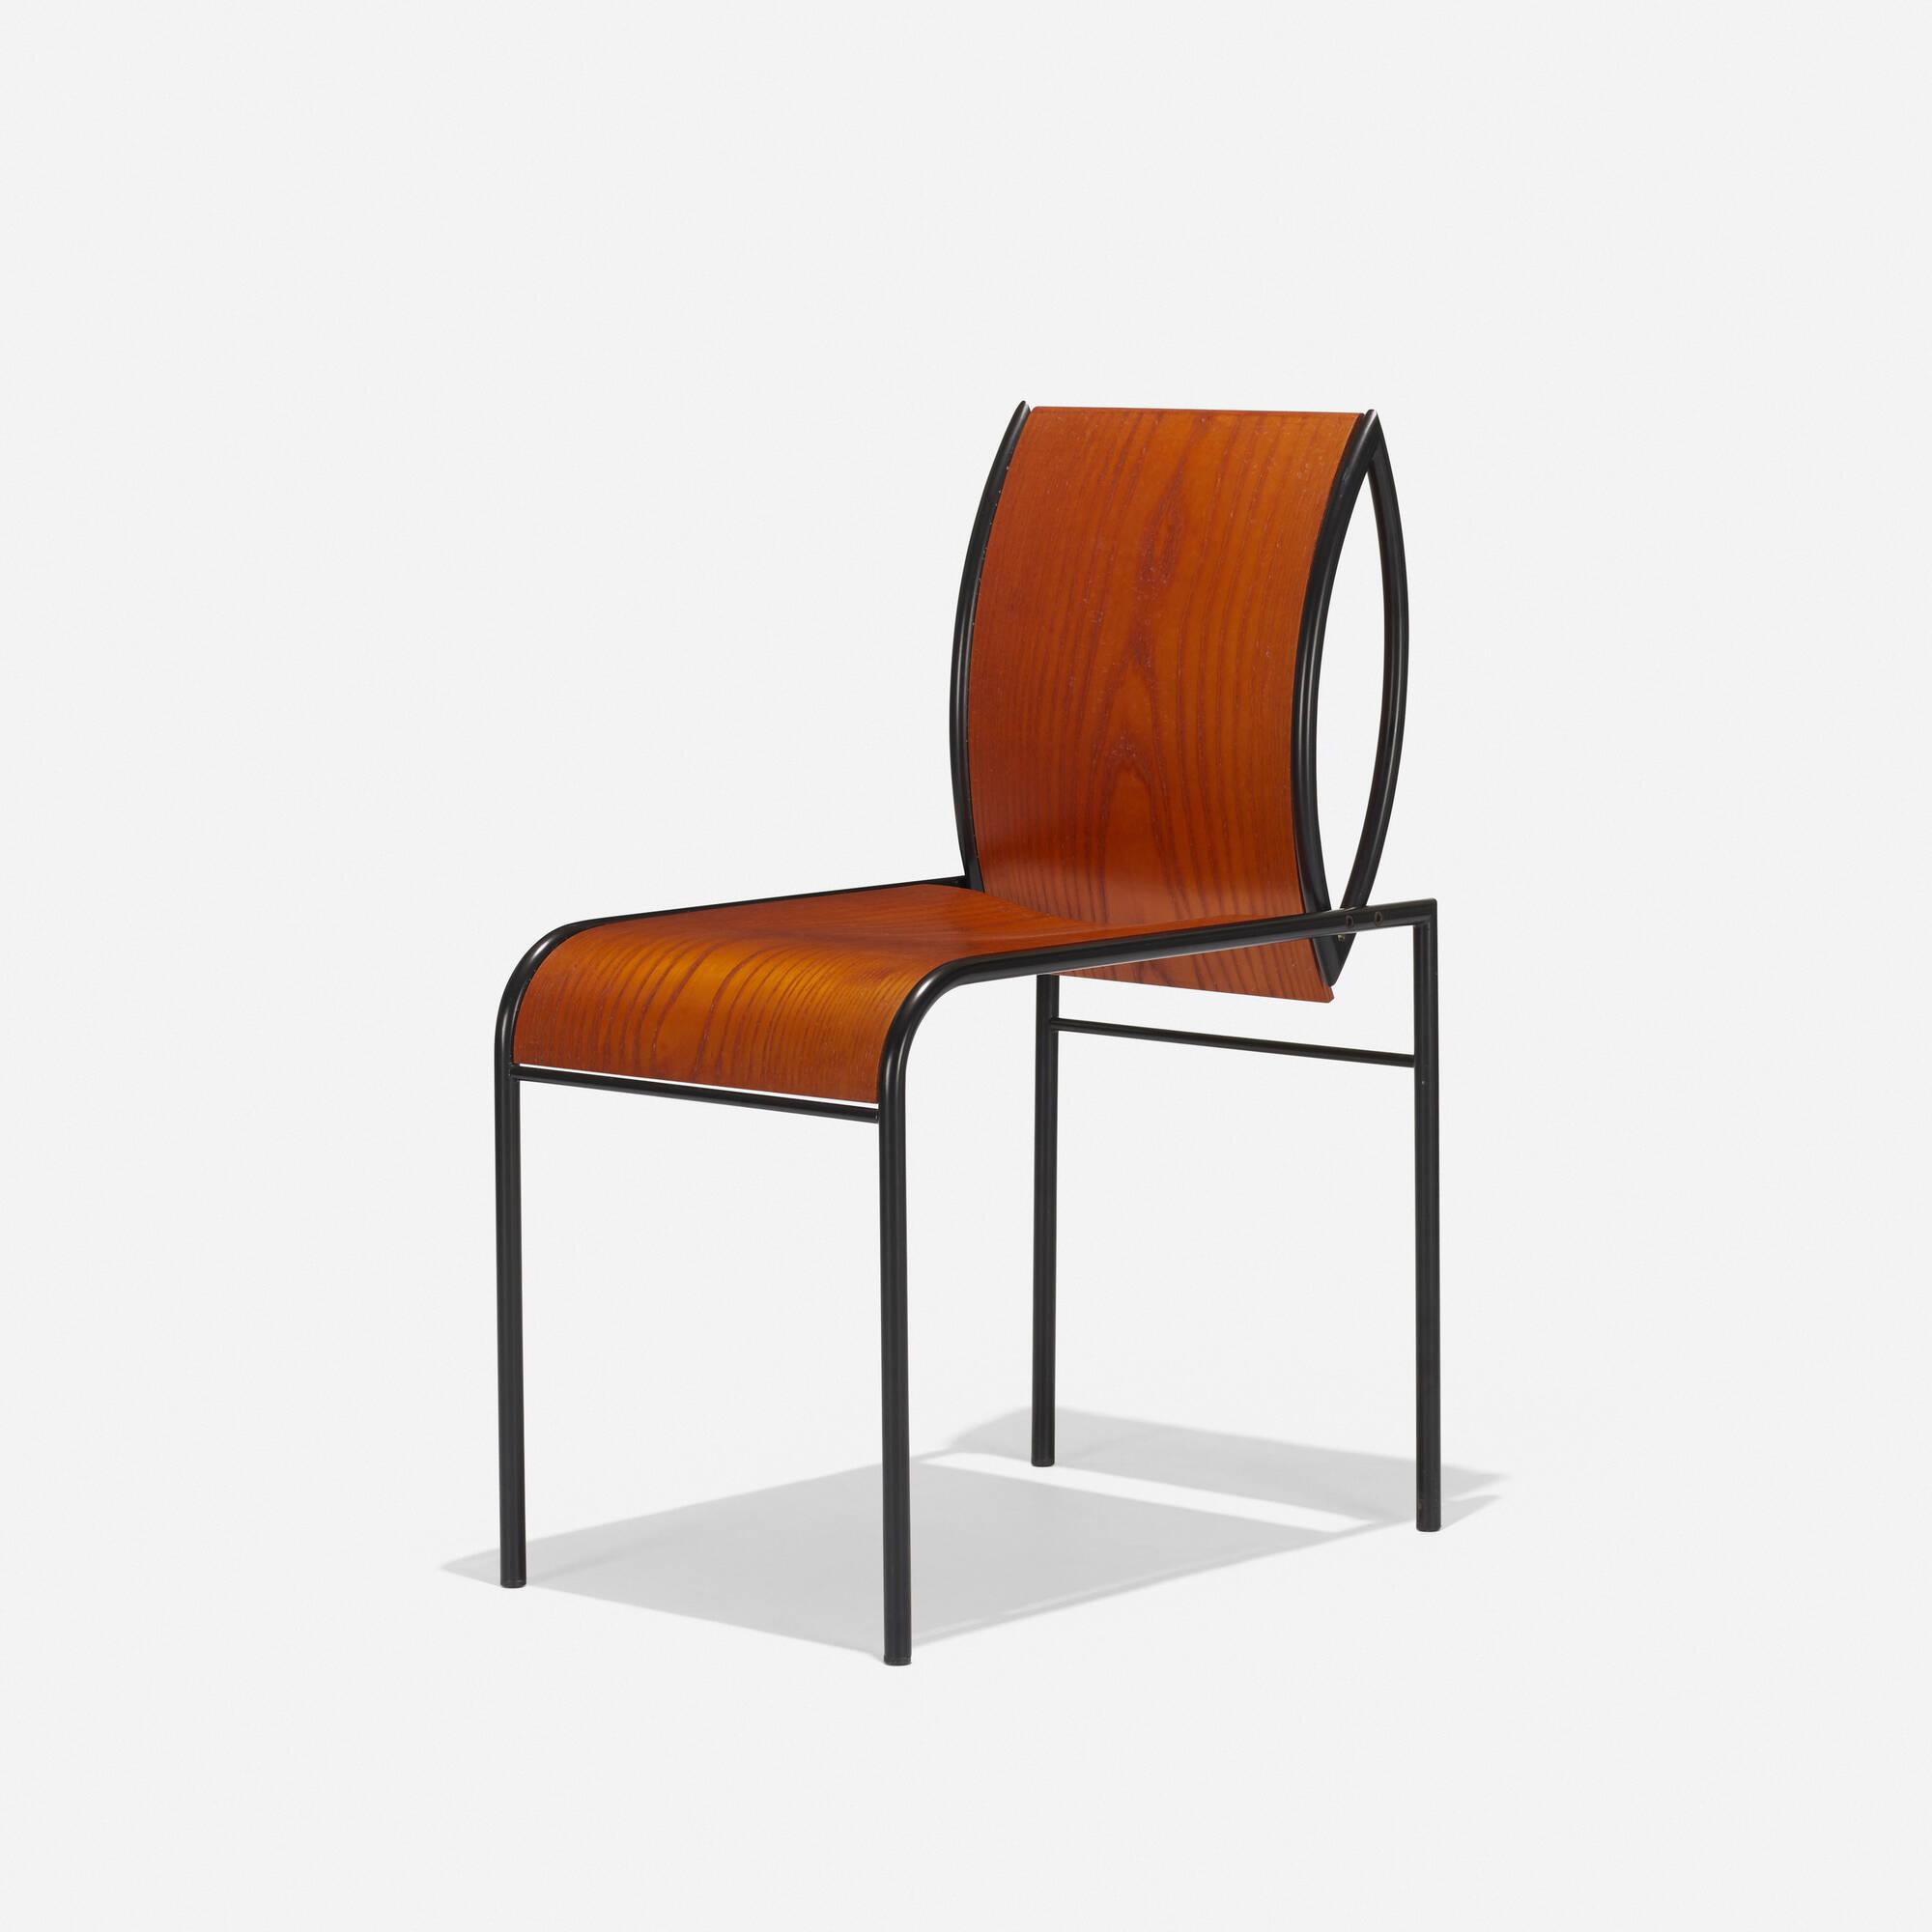 402: Michele De Lucchi / Kim chair (3 of 3)